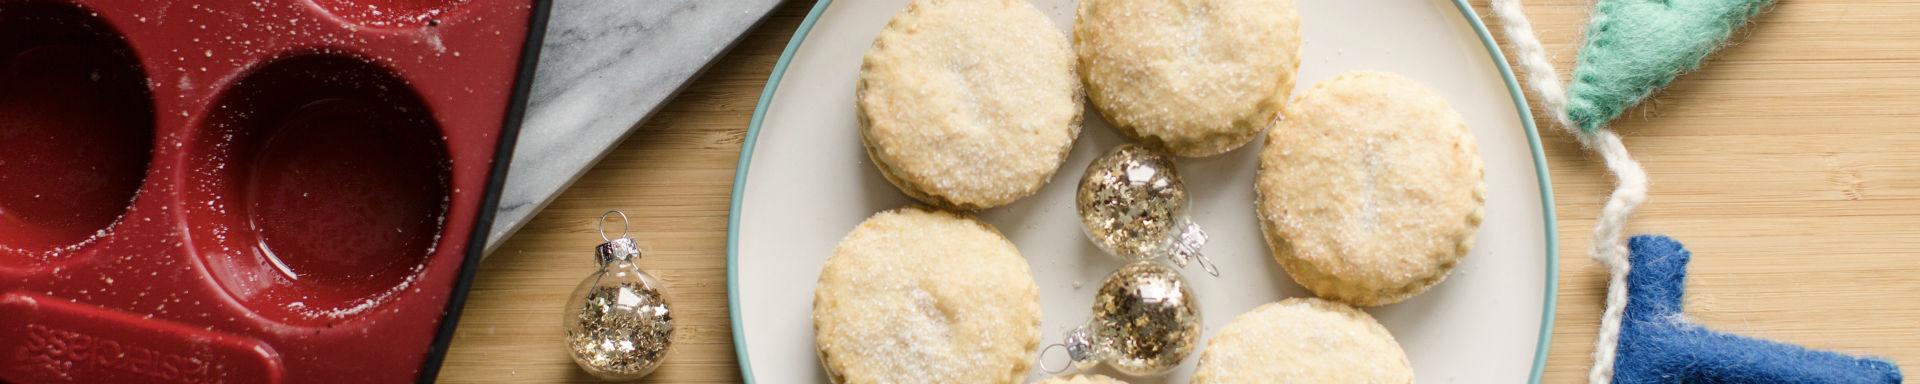 theannaedit-homemade-christmas-mince-pies-recipe-december-2016-10